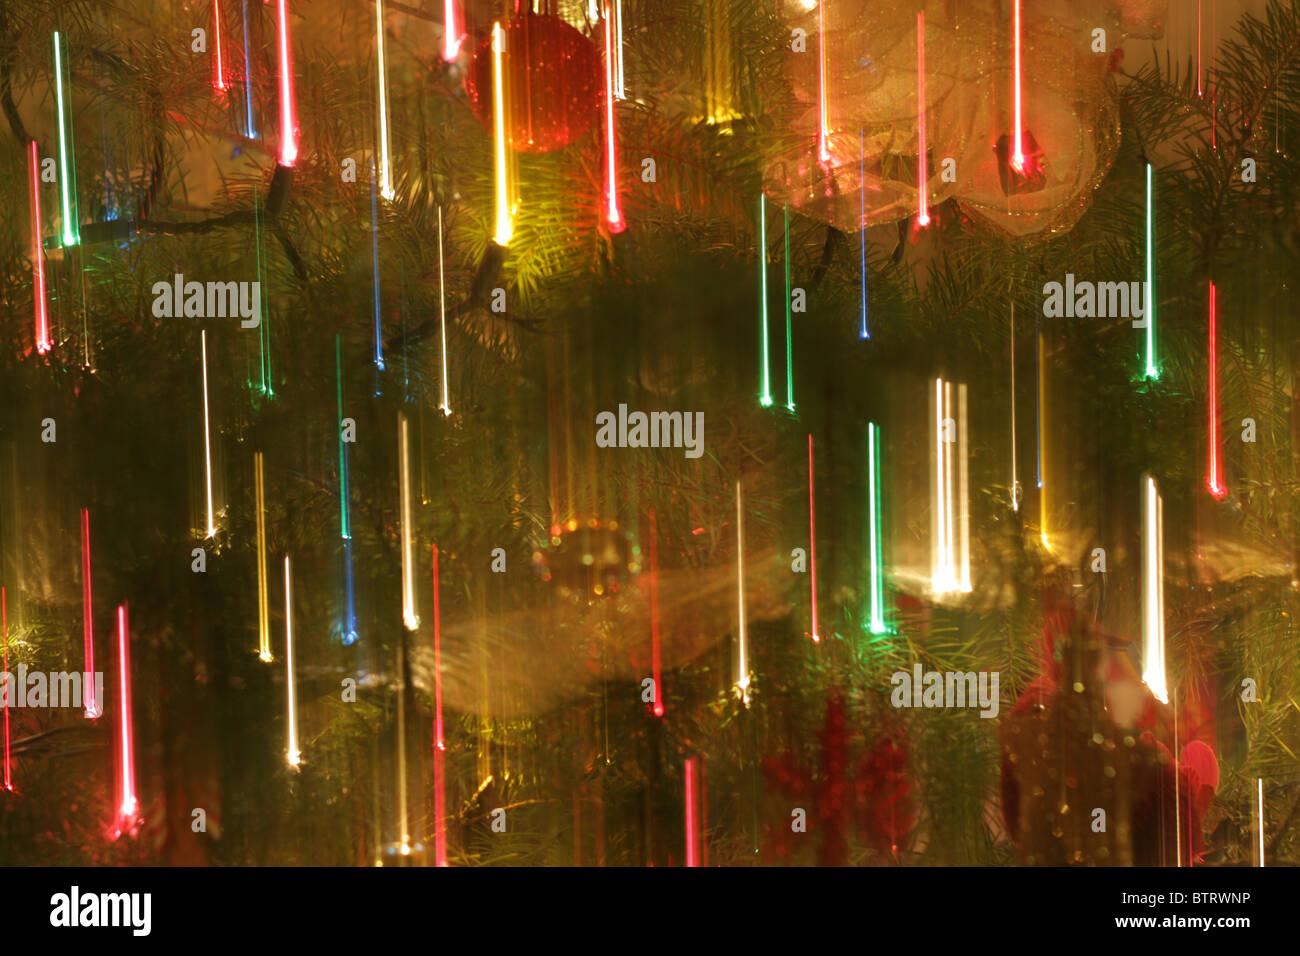 Abstract Christmas lights background - Stock Image